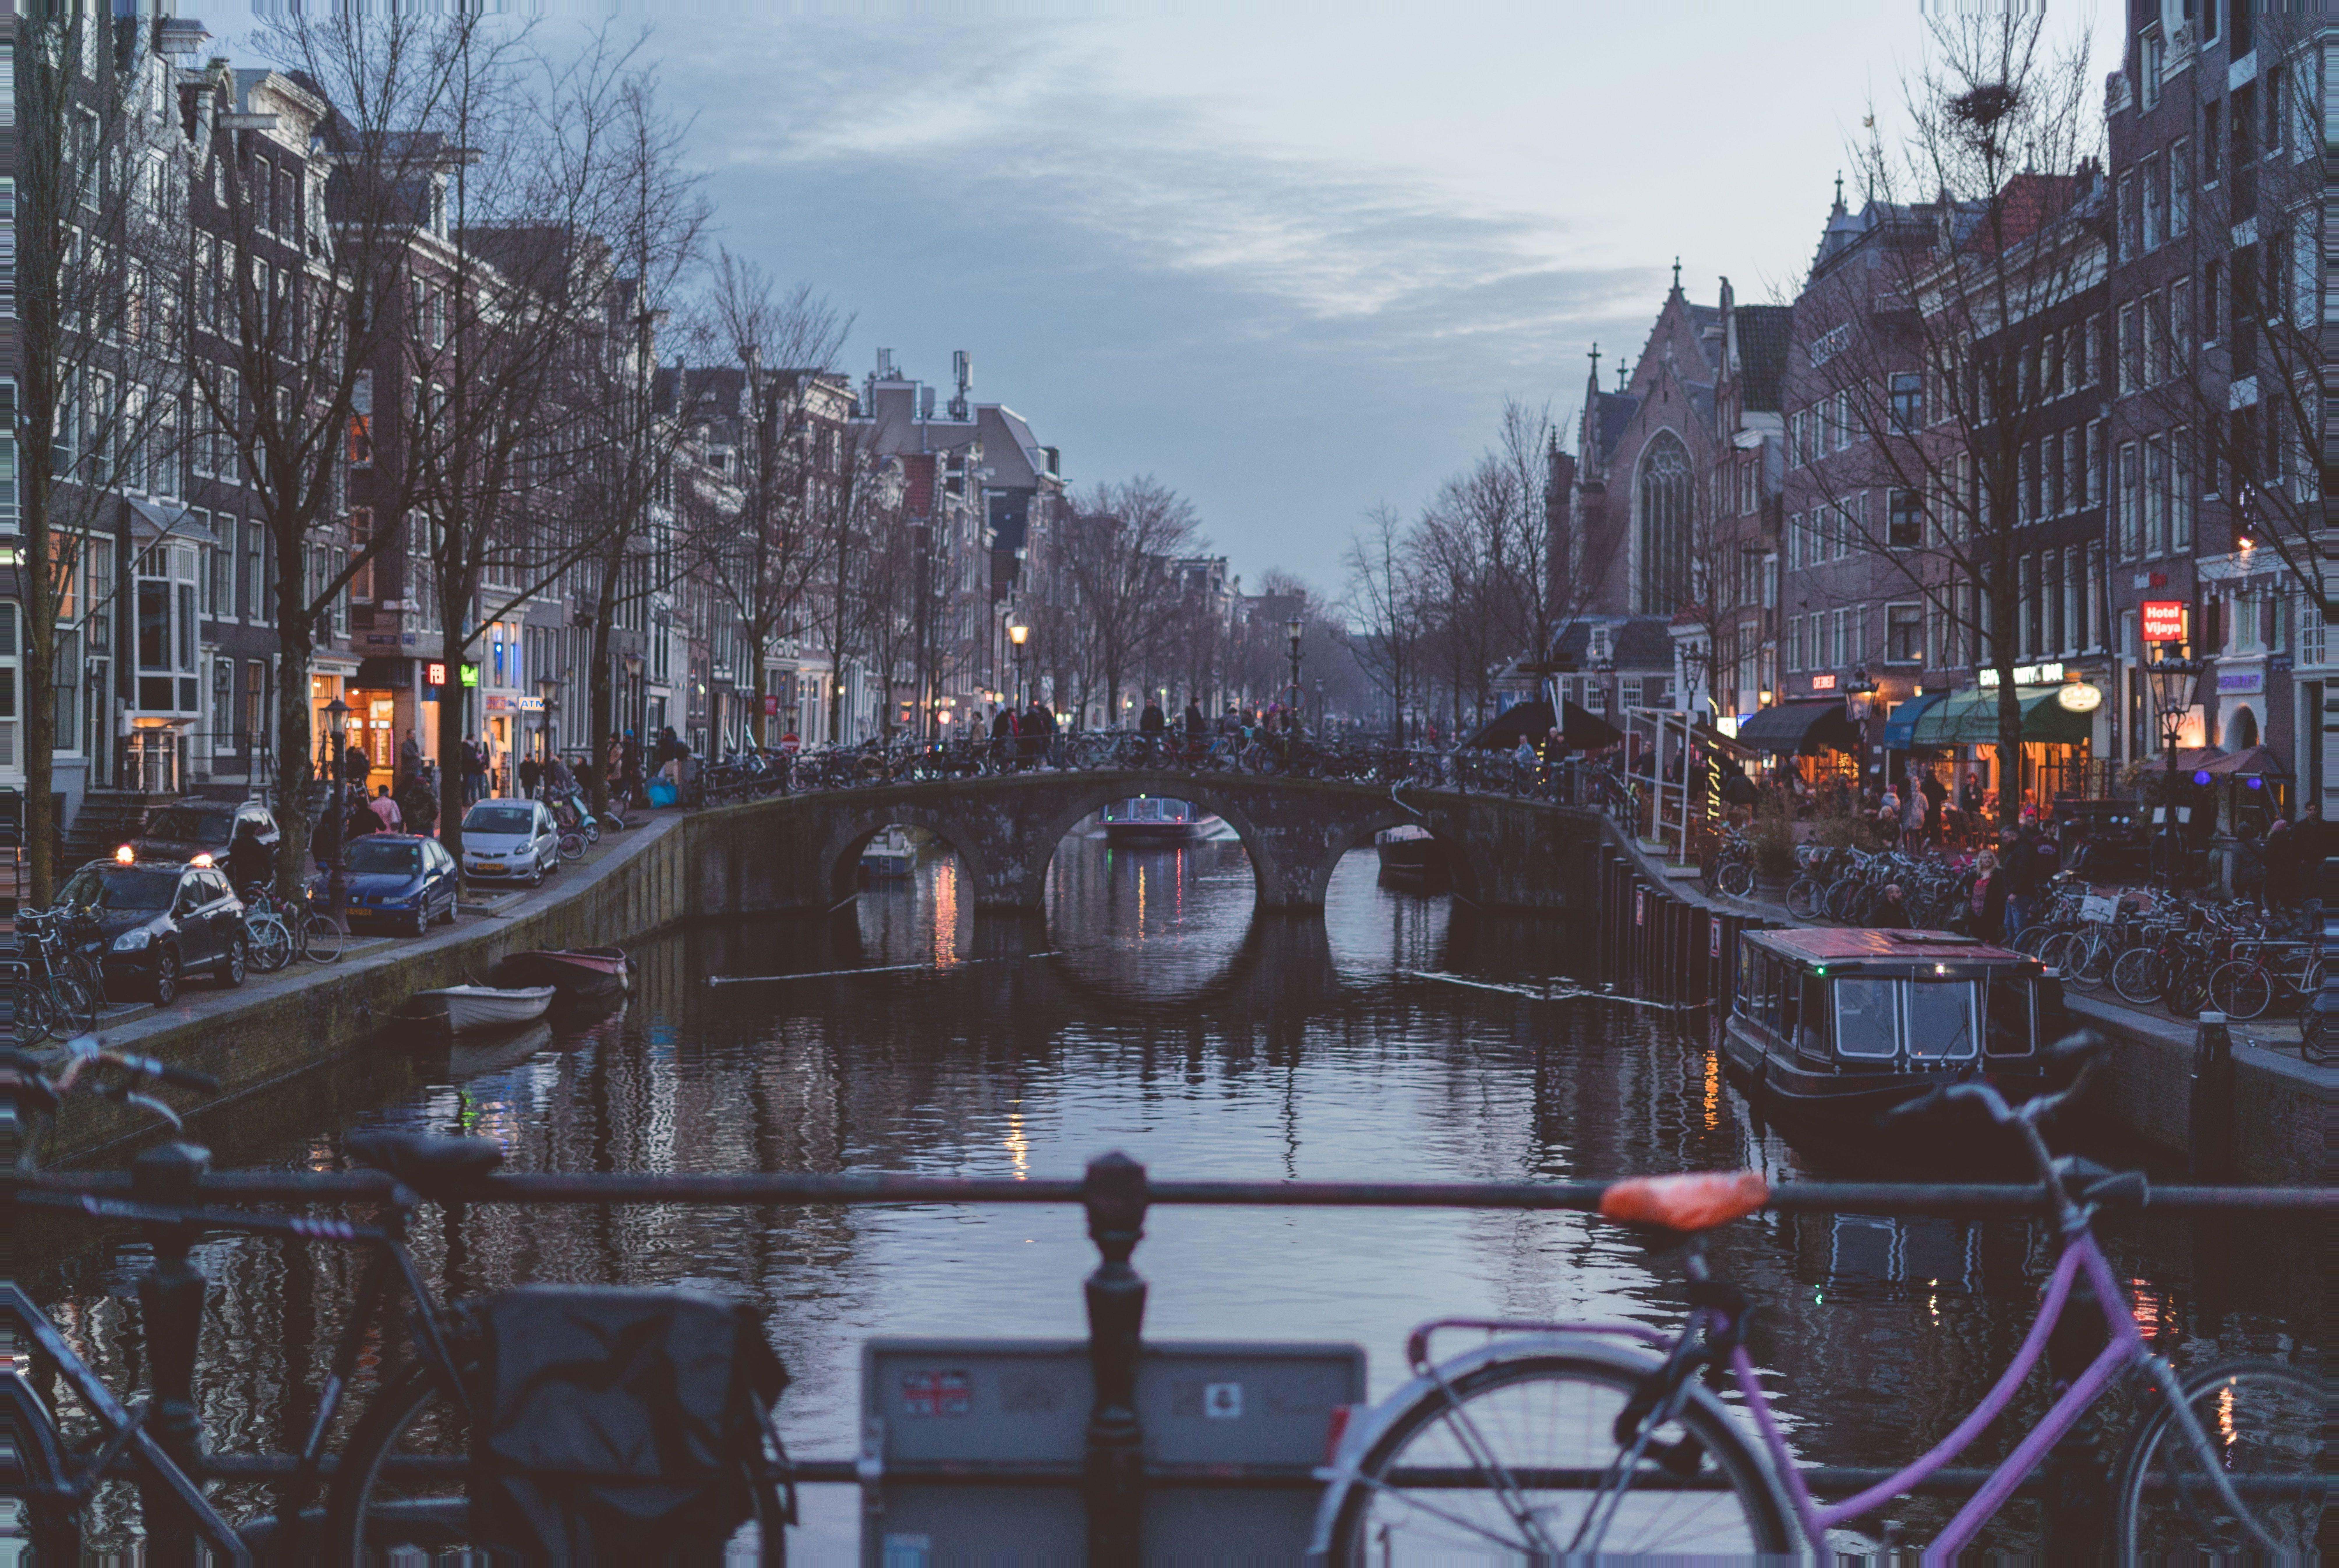 #bucket #List #travel #winter break bucket list 2020 Travel Bucket List Amsterdam, Netherlands, travel, travel blogger, travel influencer, city break,…